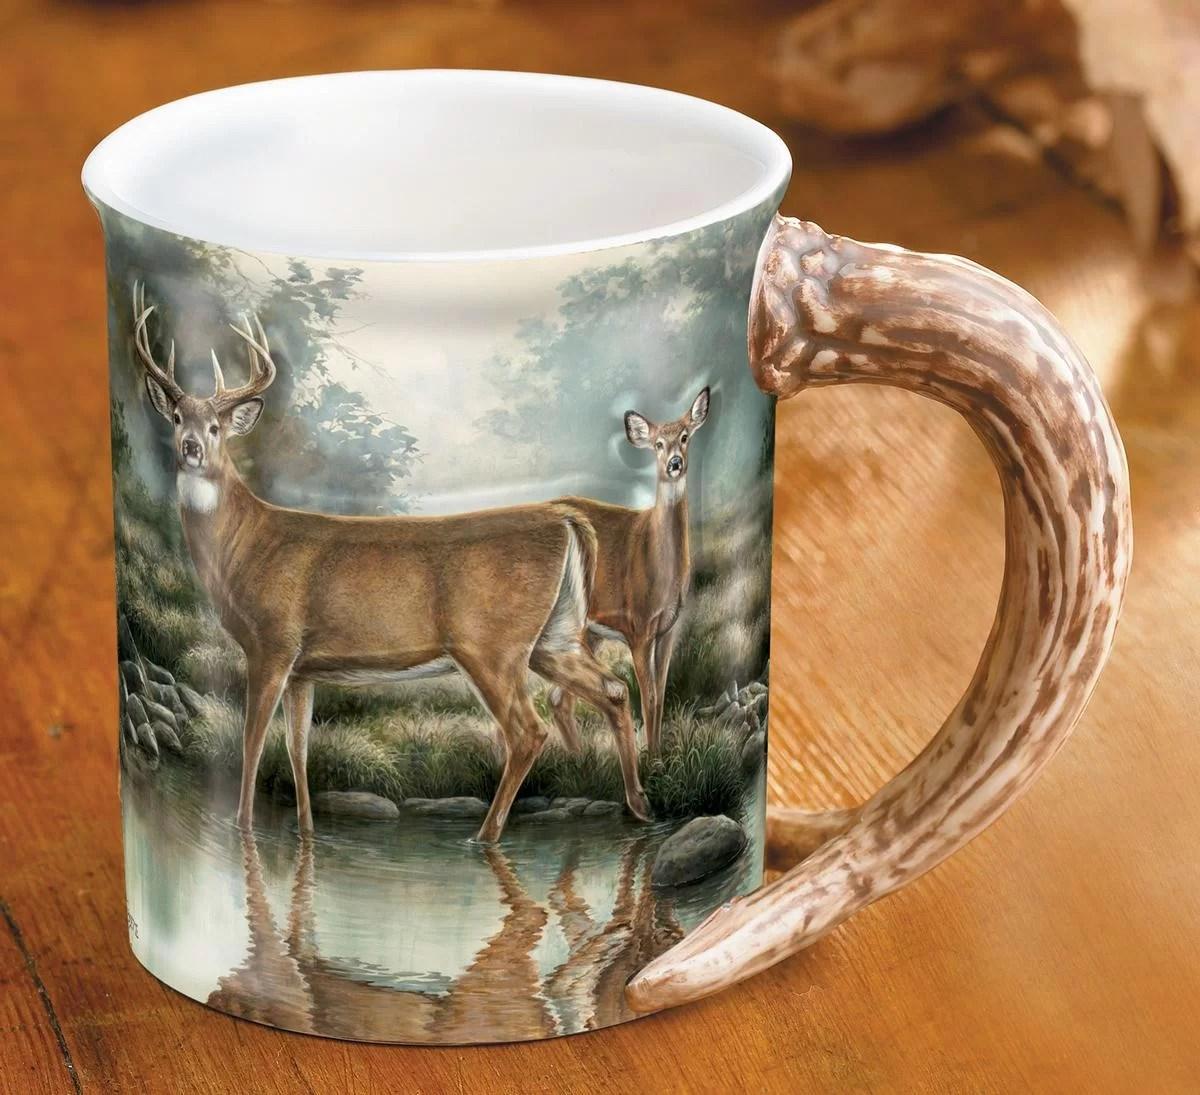 Barrier Bay Resort Collector Mug - Tranquil Waters Mug